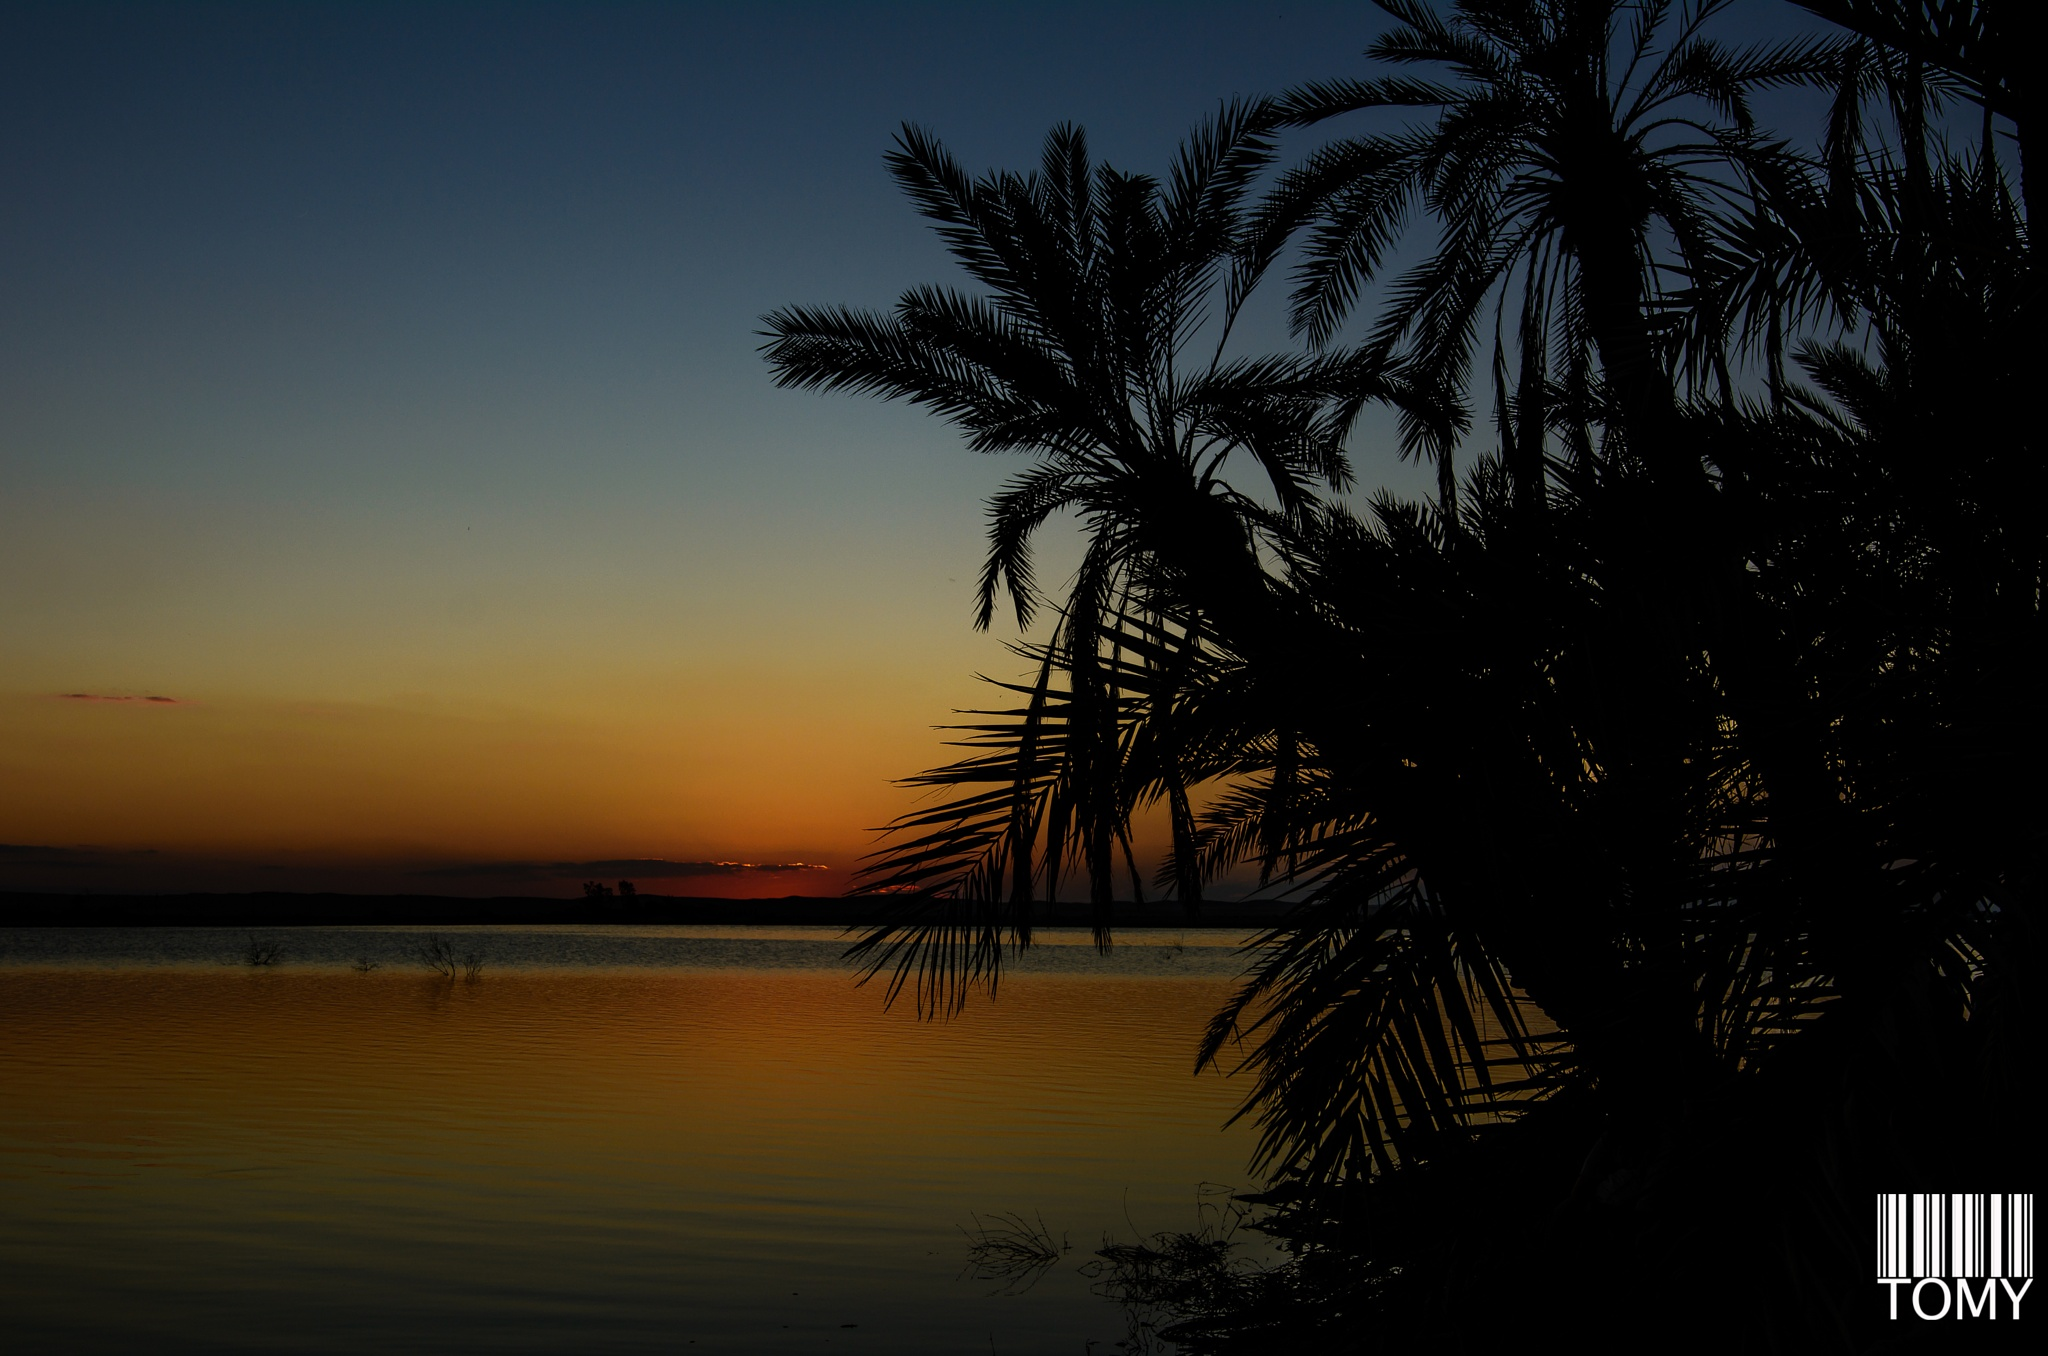 sunset i Siwa by Hatem Tomy